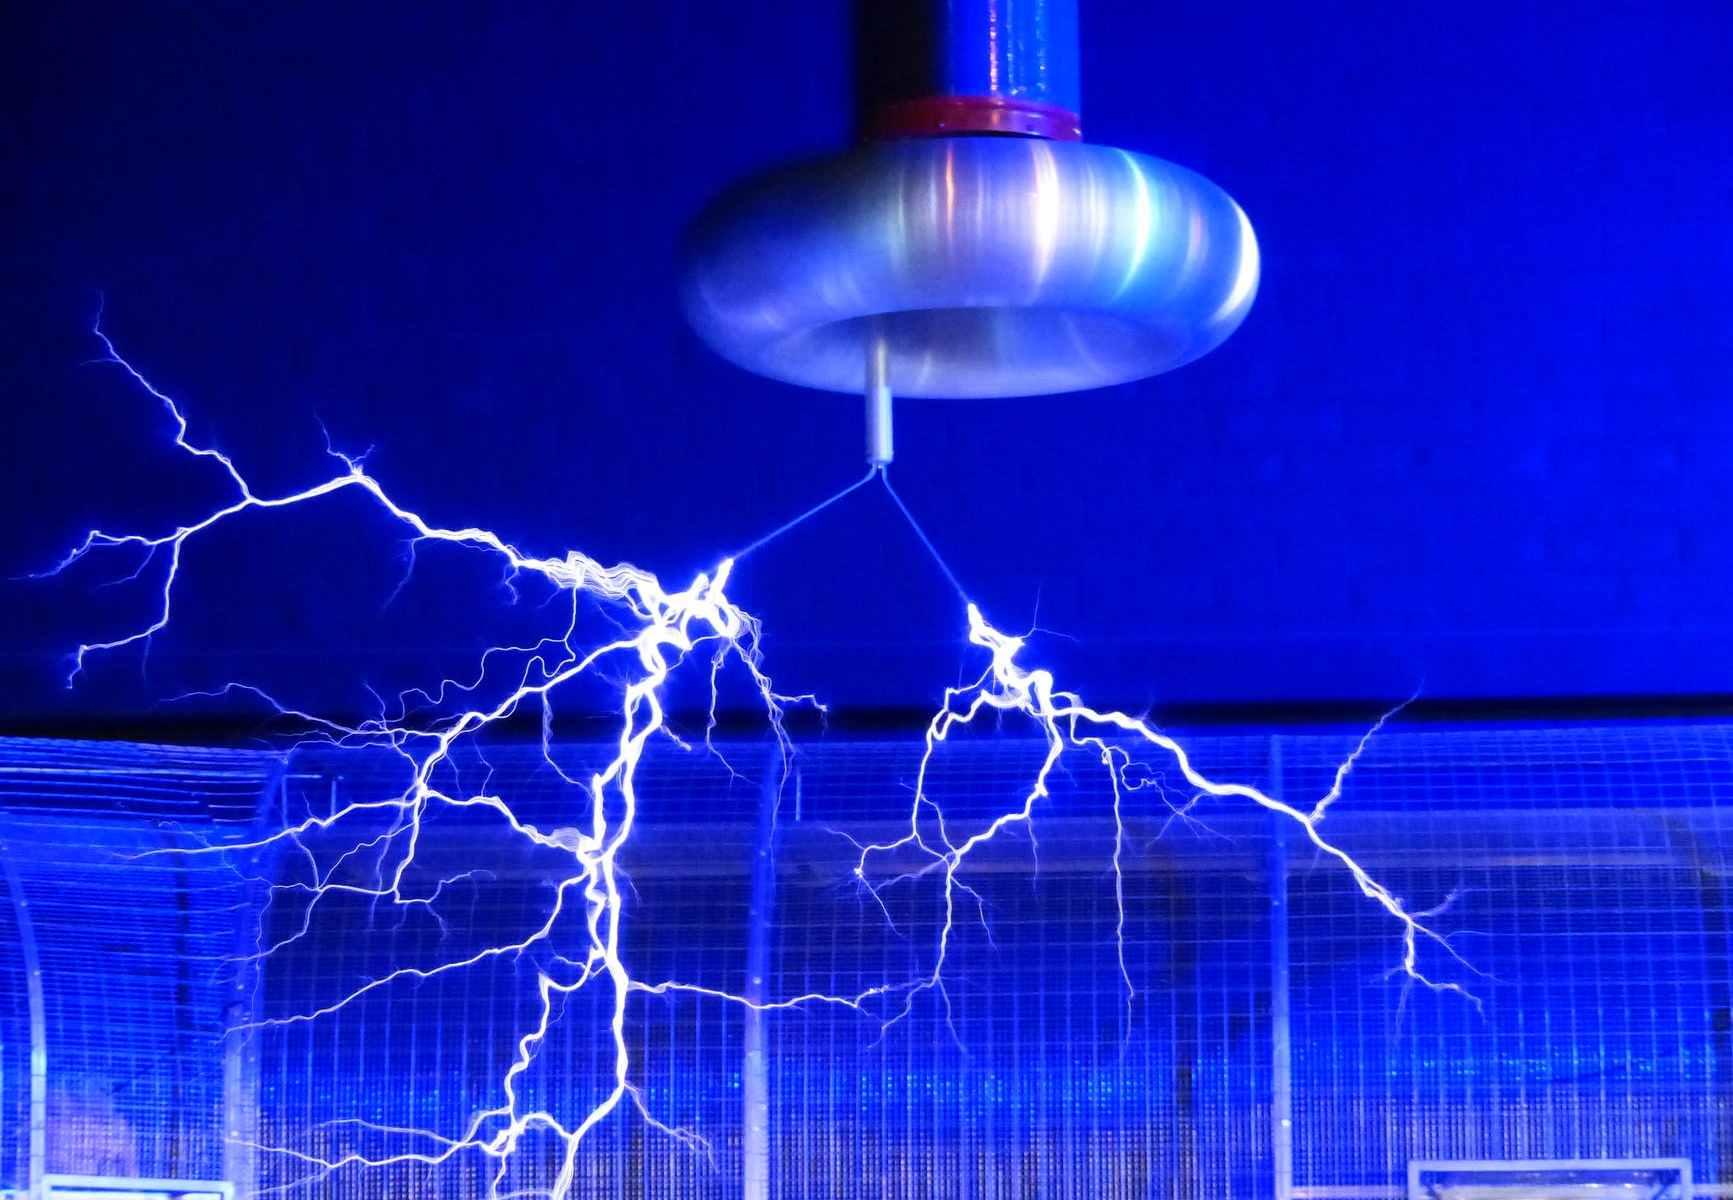 blue electric sparks